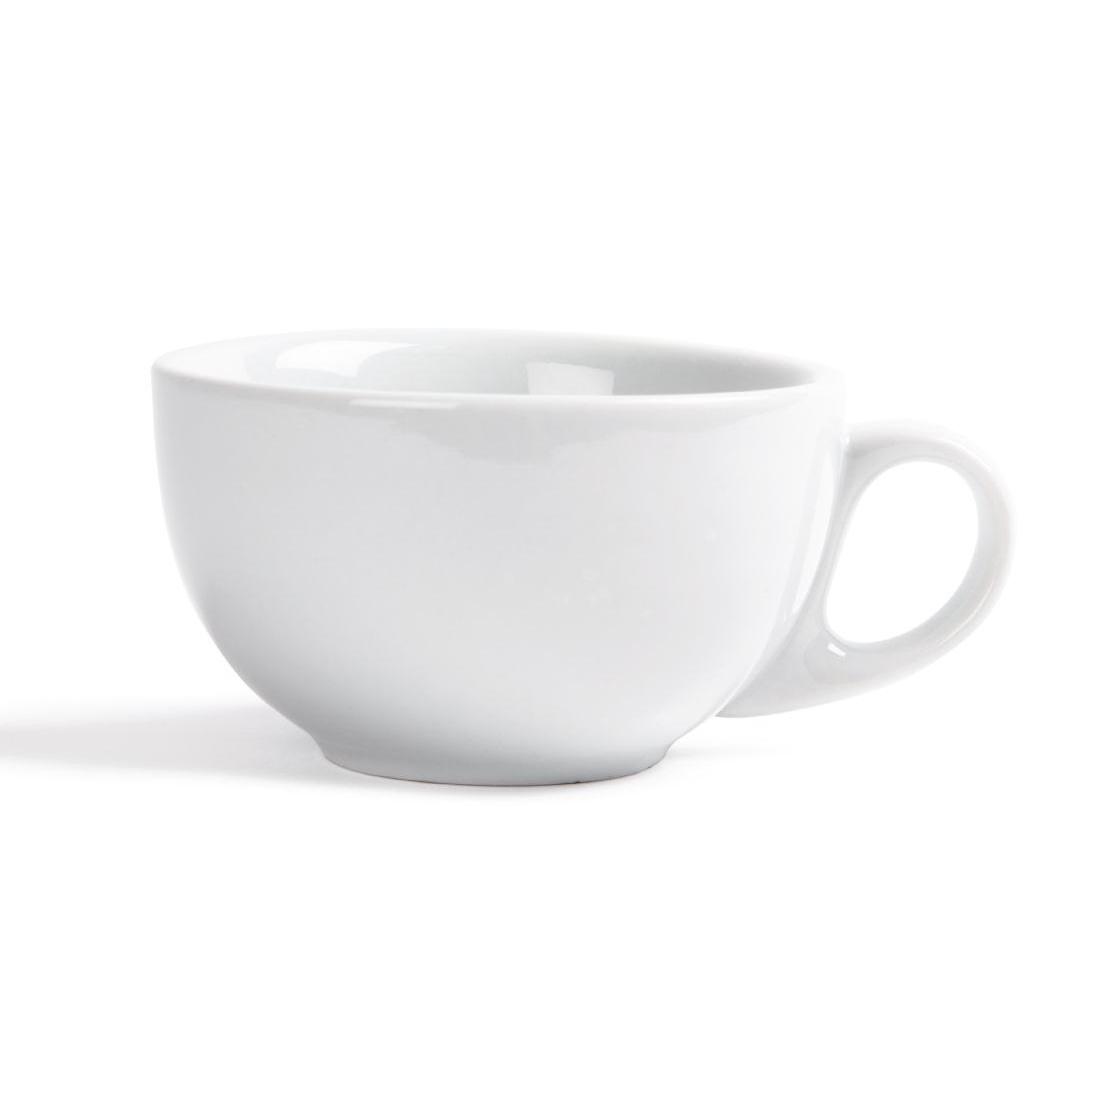 Tasses à cappuccino Athena Hotelware 285ml par 12